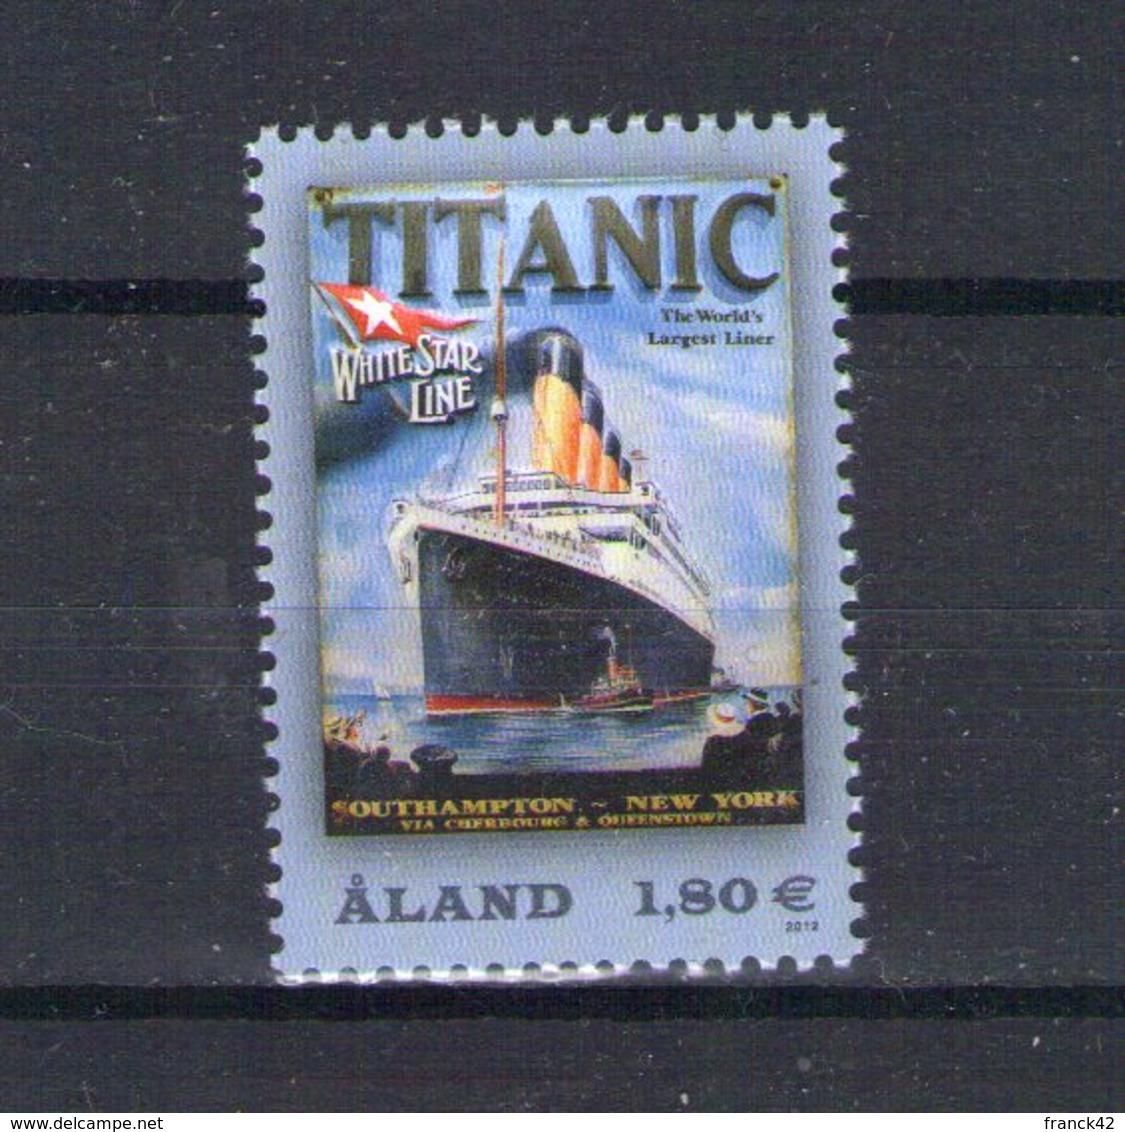 Aland. Centenaire Du Titanic - Aland